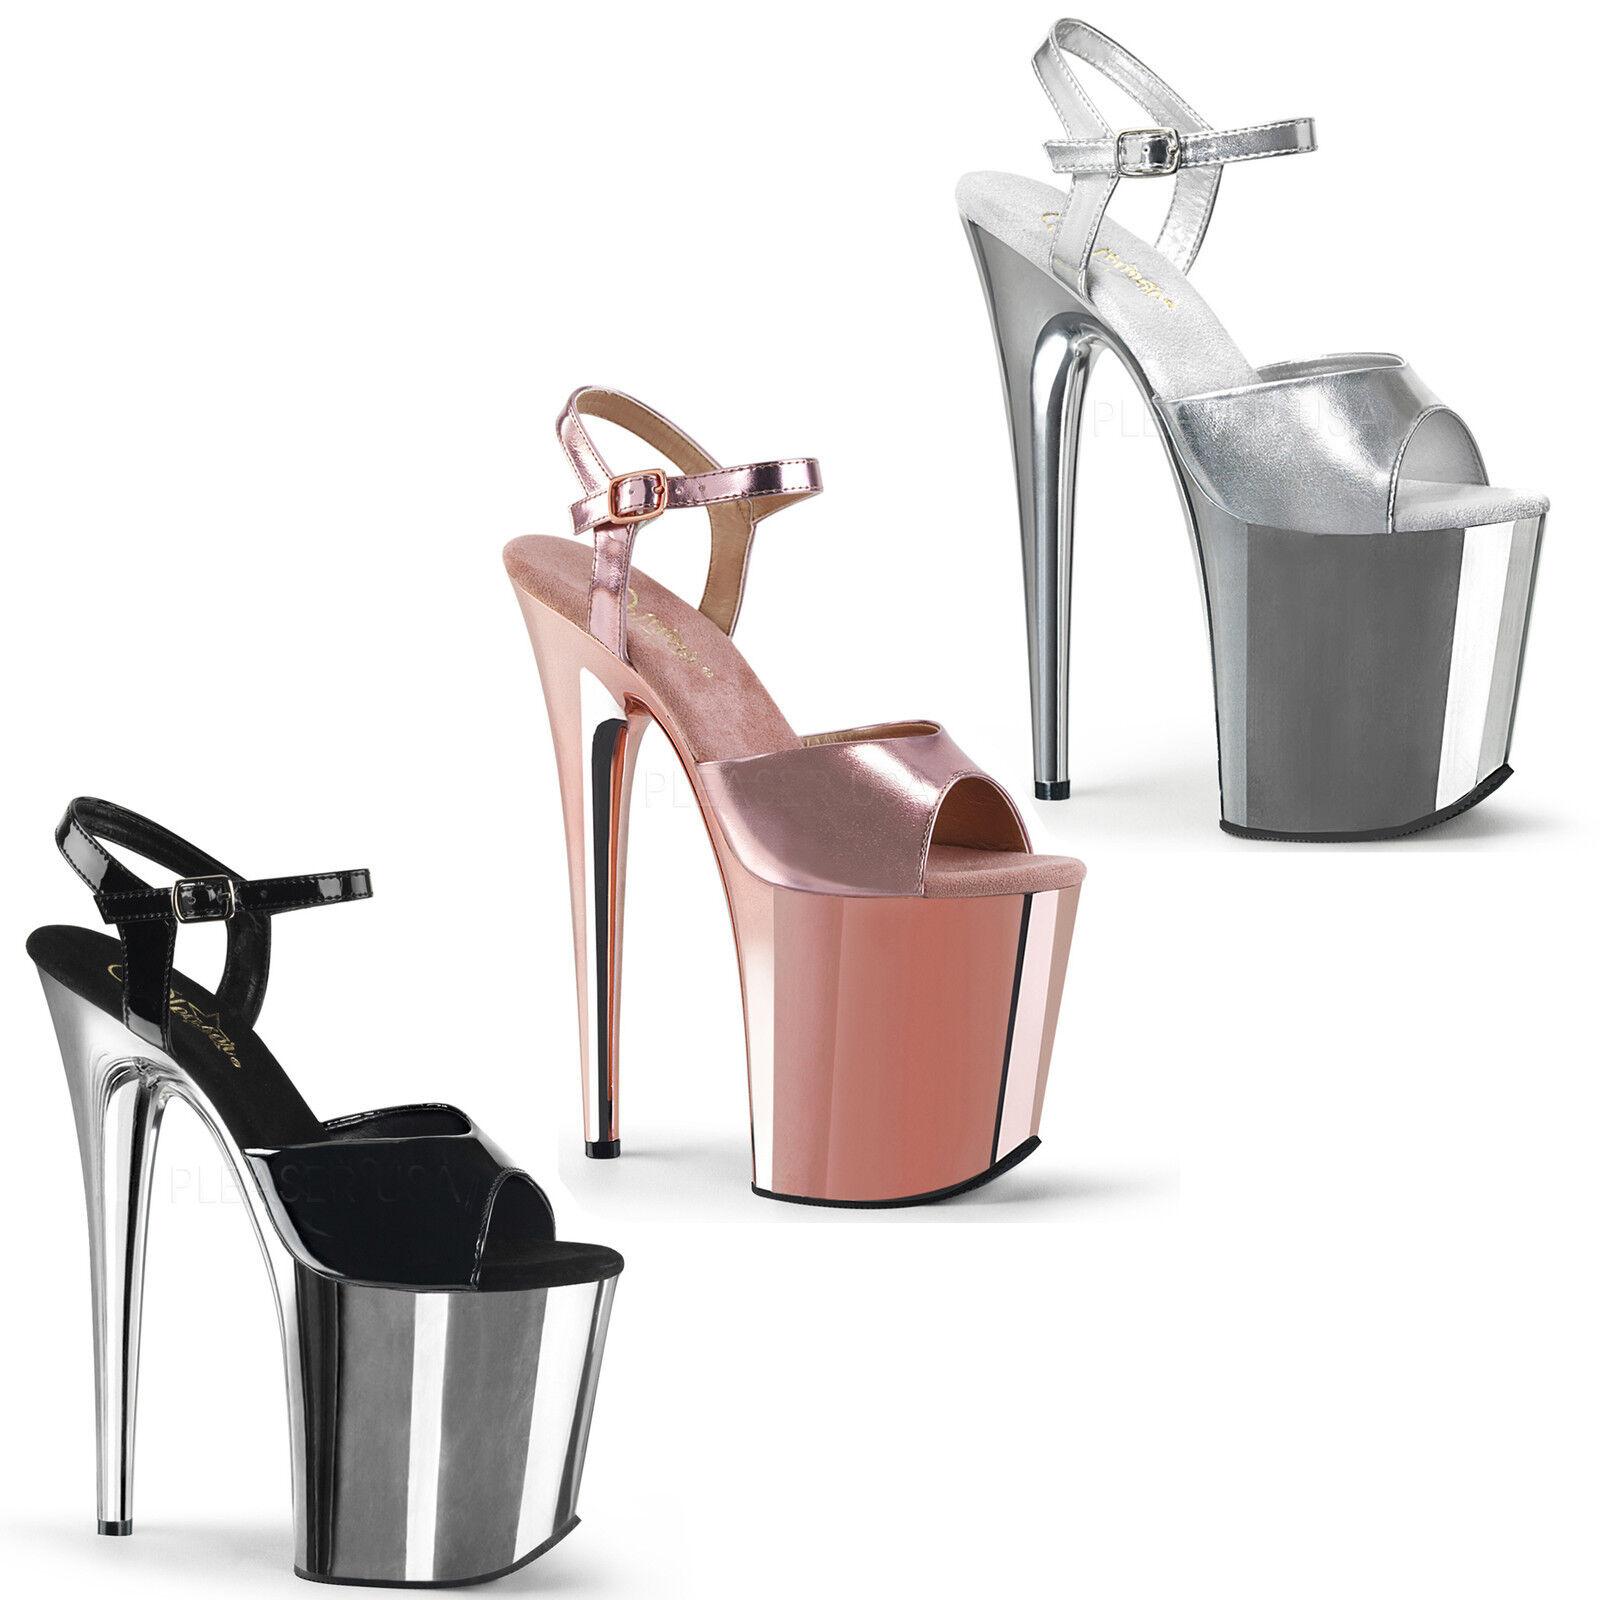 Flamingo-809 High Heels Plateausandaletten black silver pink chrom Gr 35-43